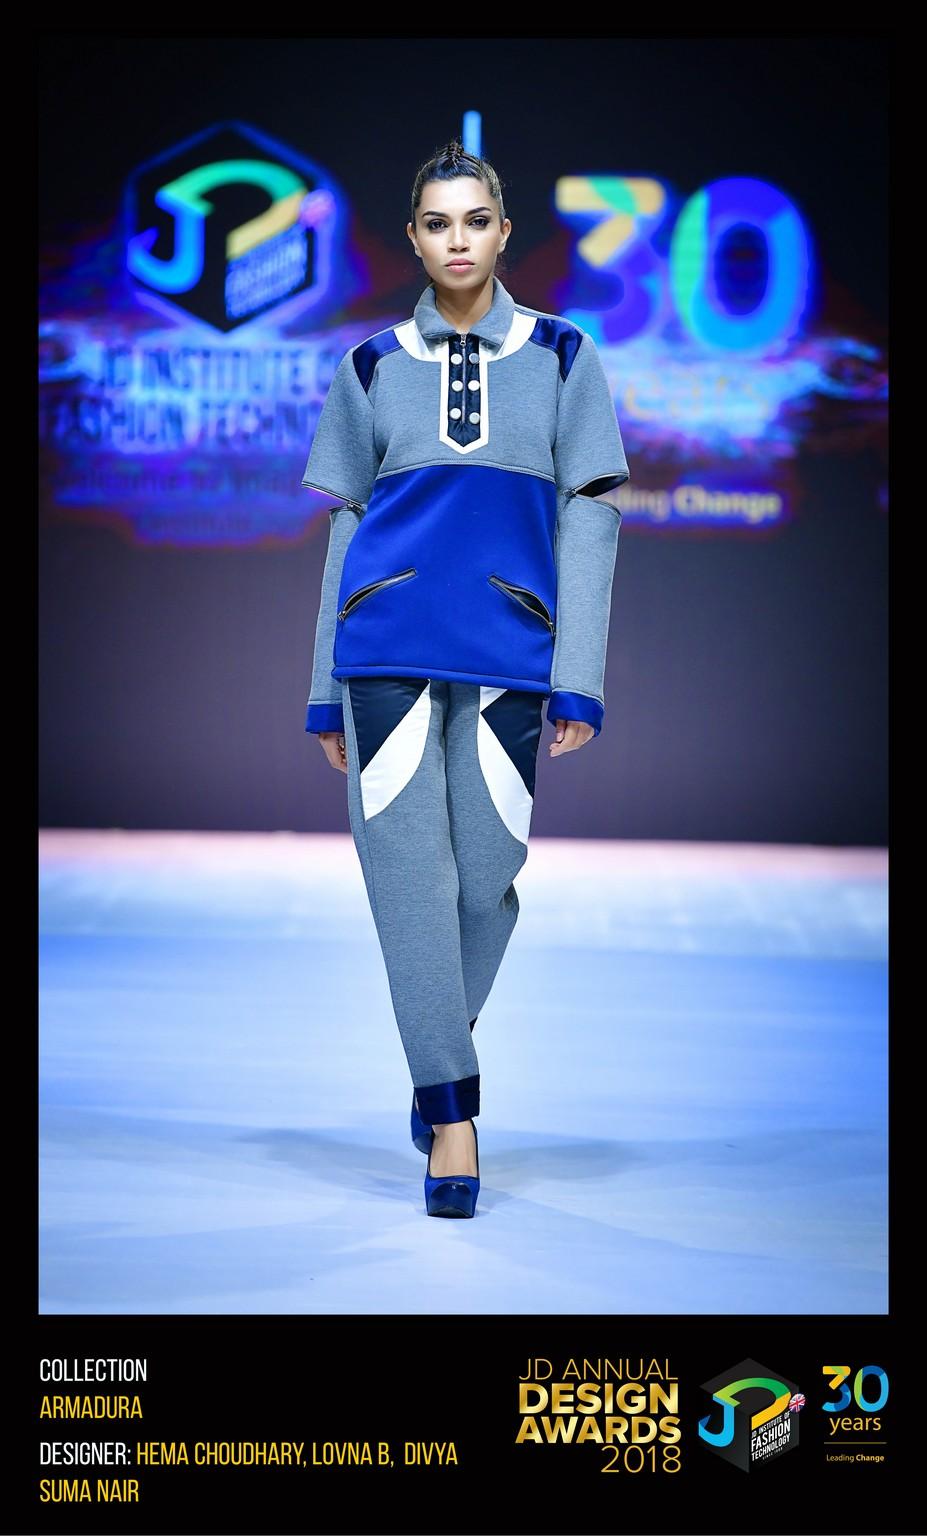 Armadura Collection – Change – JD Annual Design Awards 2018 | Designer: Hema, Lovna, Divya | Photography : Jerin Nath (@jerin_nath) armadura collection - ARMADURA3 - Armadura Collection – Change – JD Annual Design Awards 2018